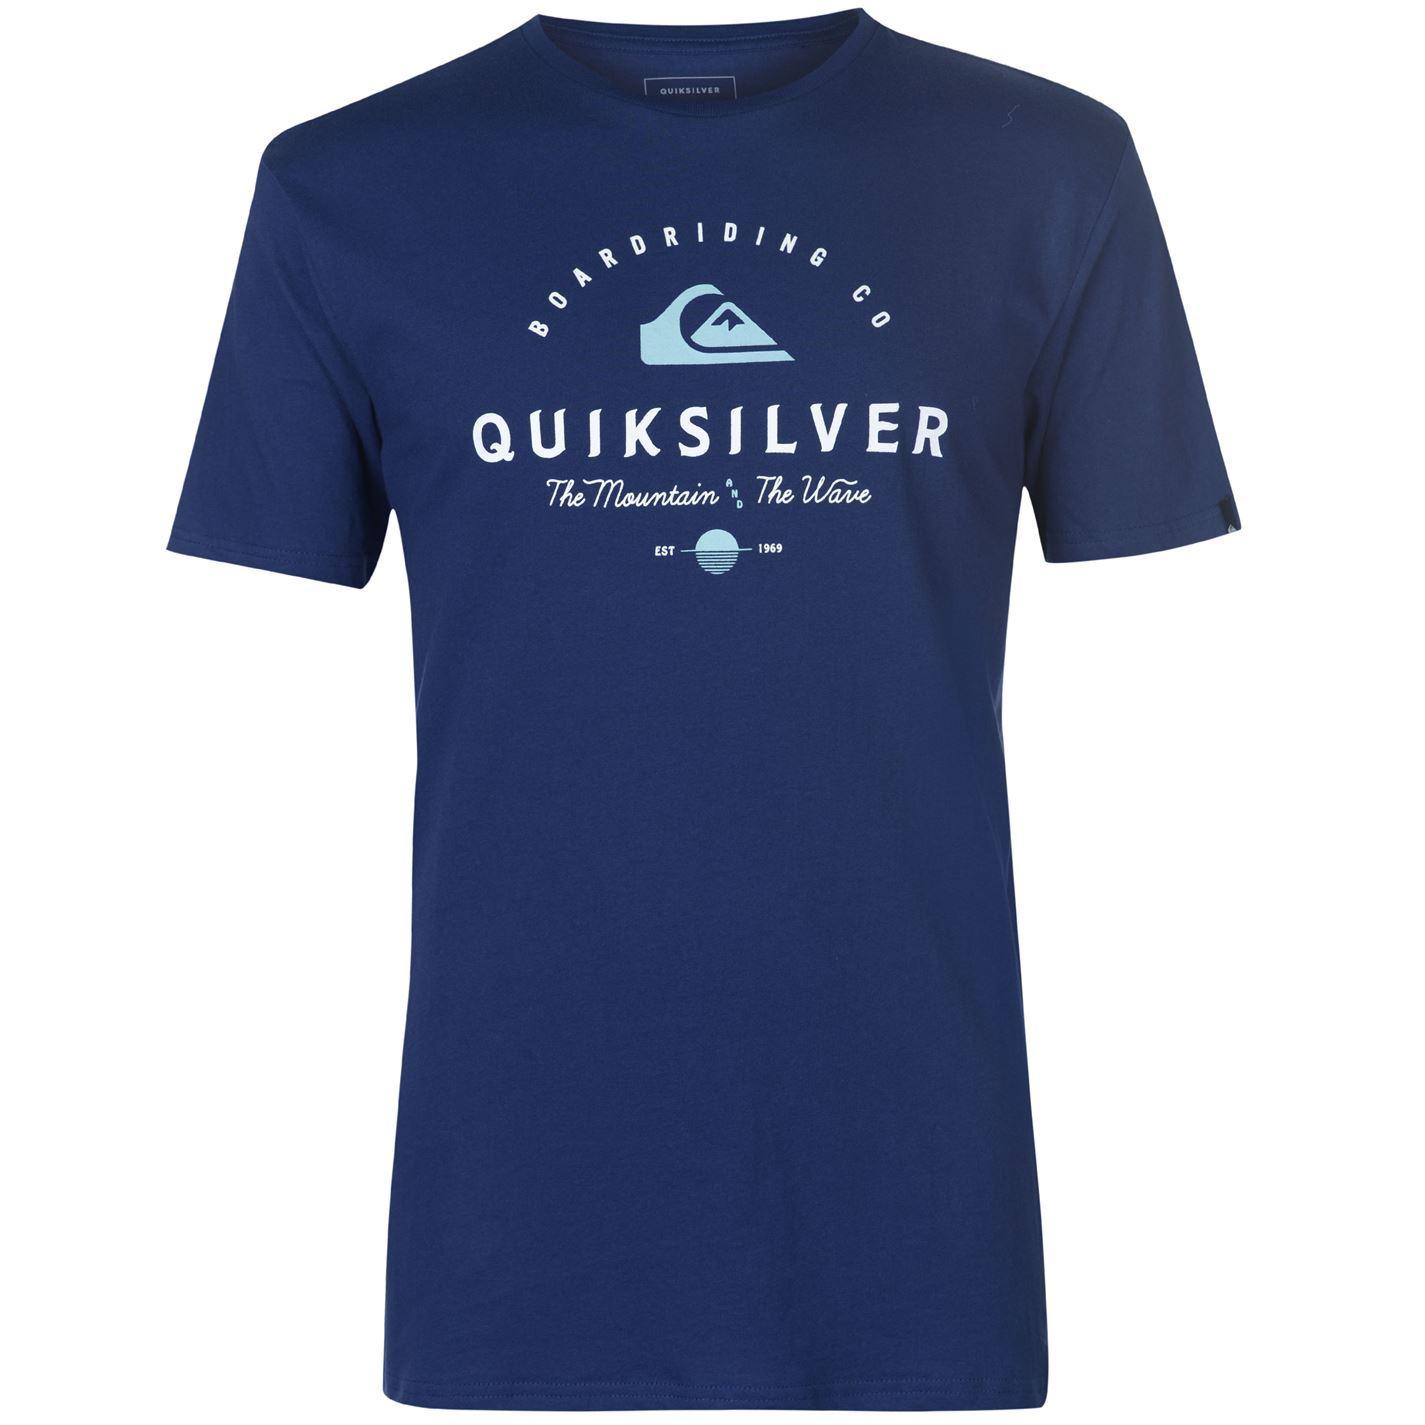 Quiksilver-Working-Man-T-Shirt-Mens-Tee-Shirt-Top thumbnail 6